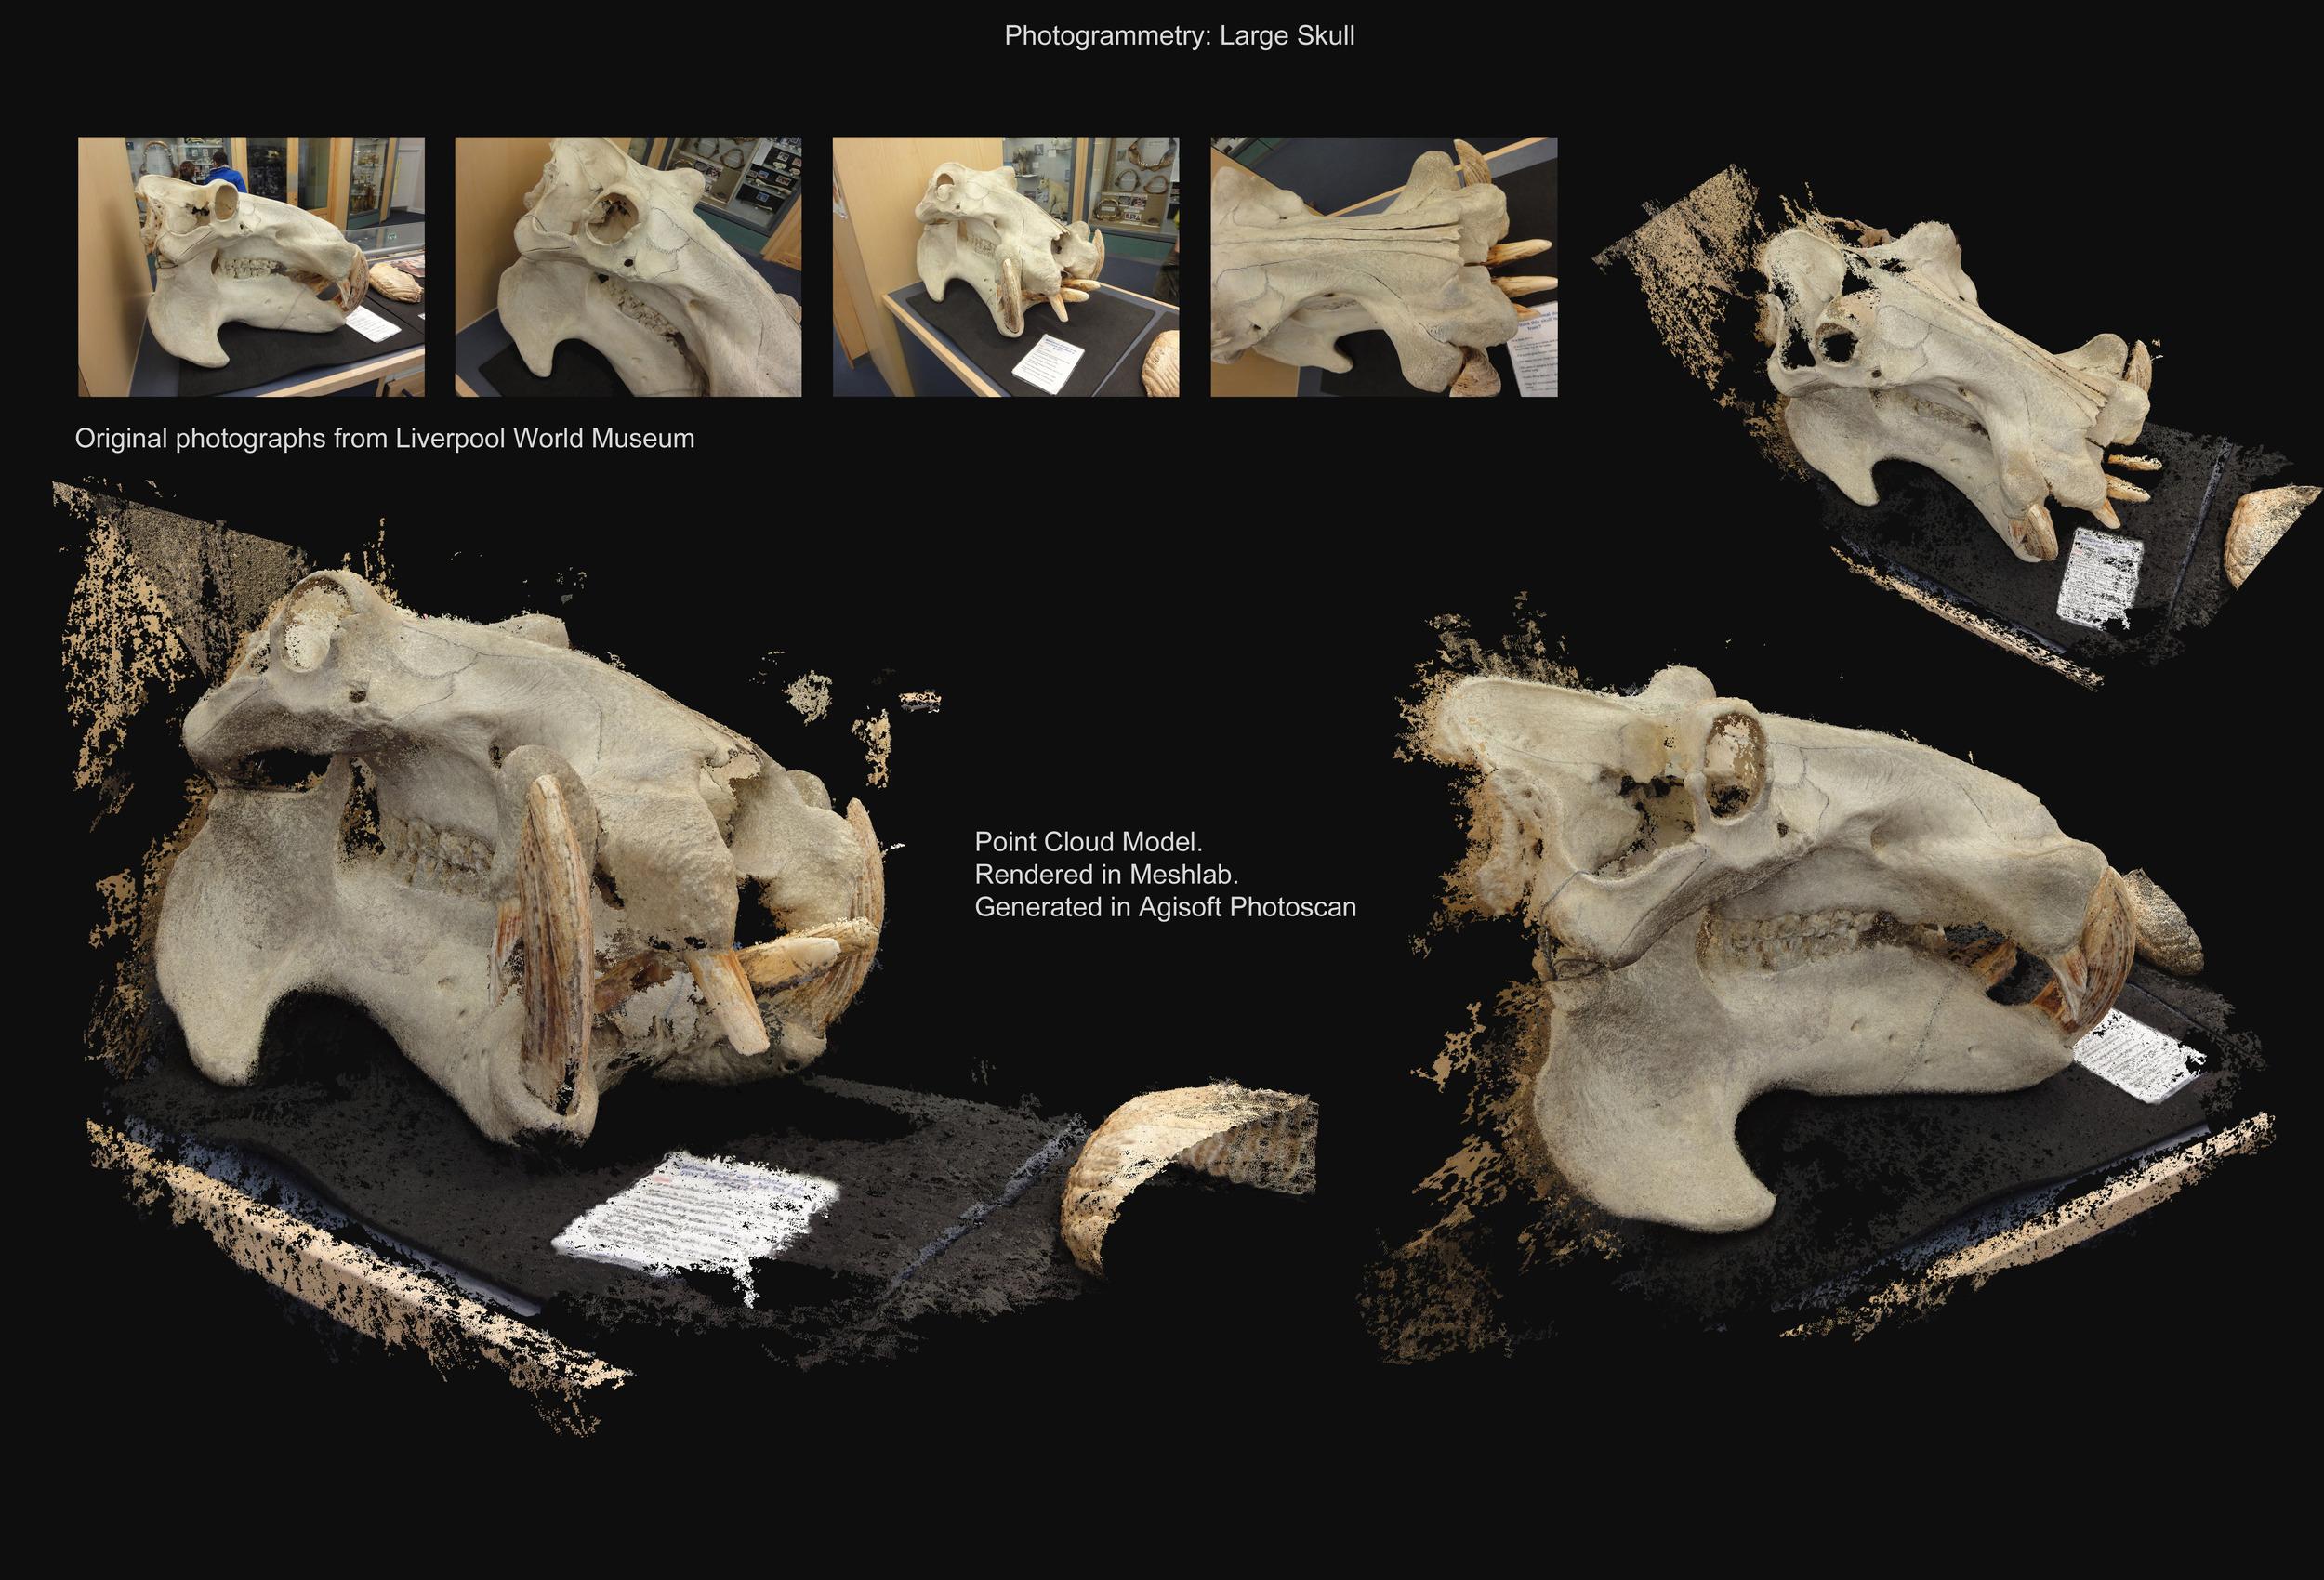 Large Skull - Photogrammetry - David McDonald